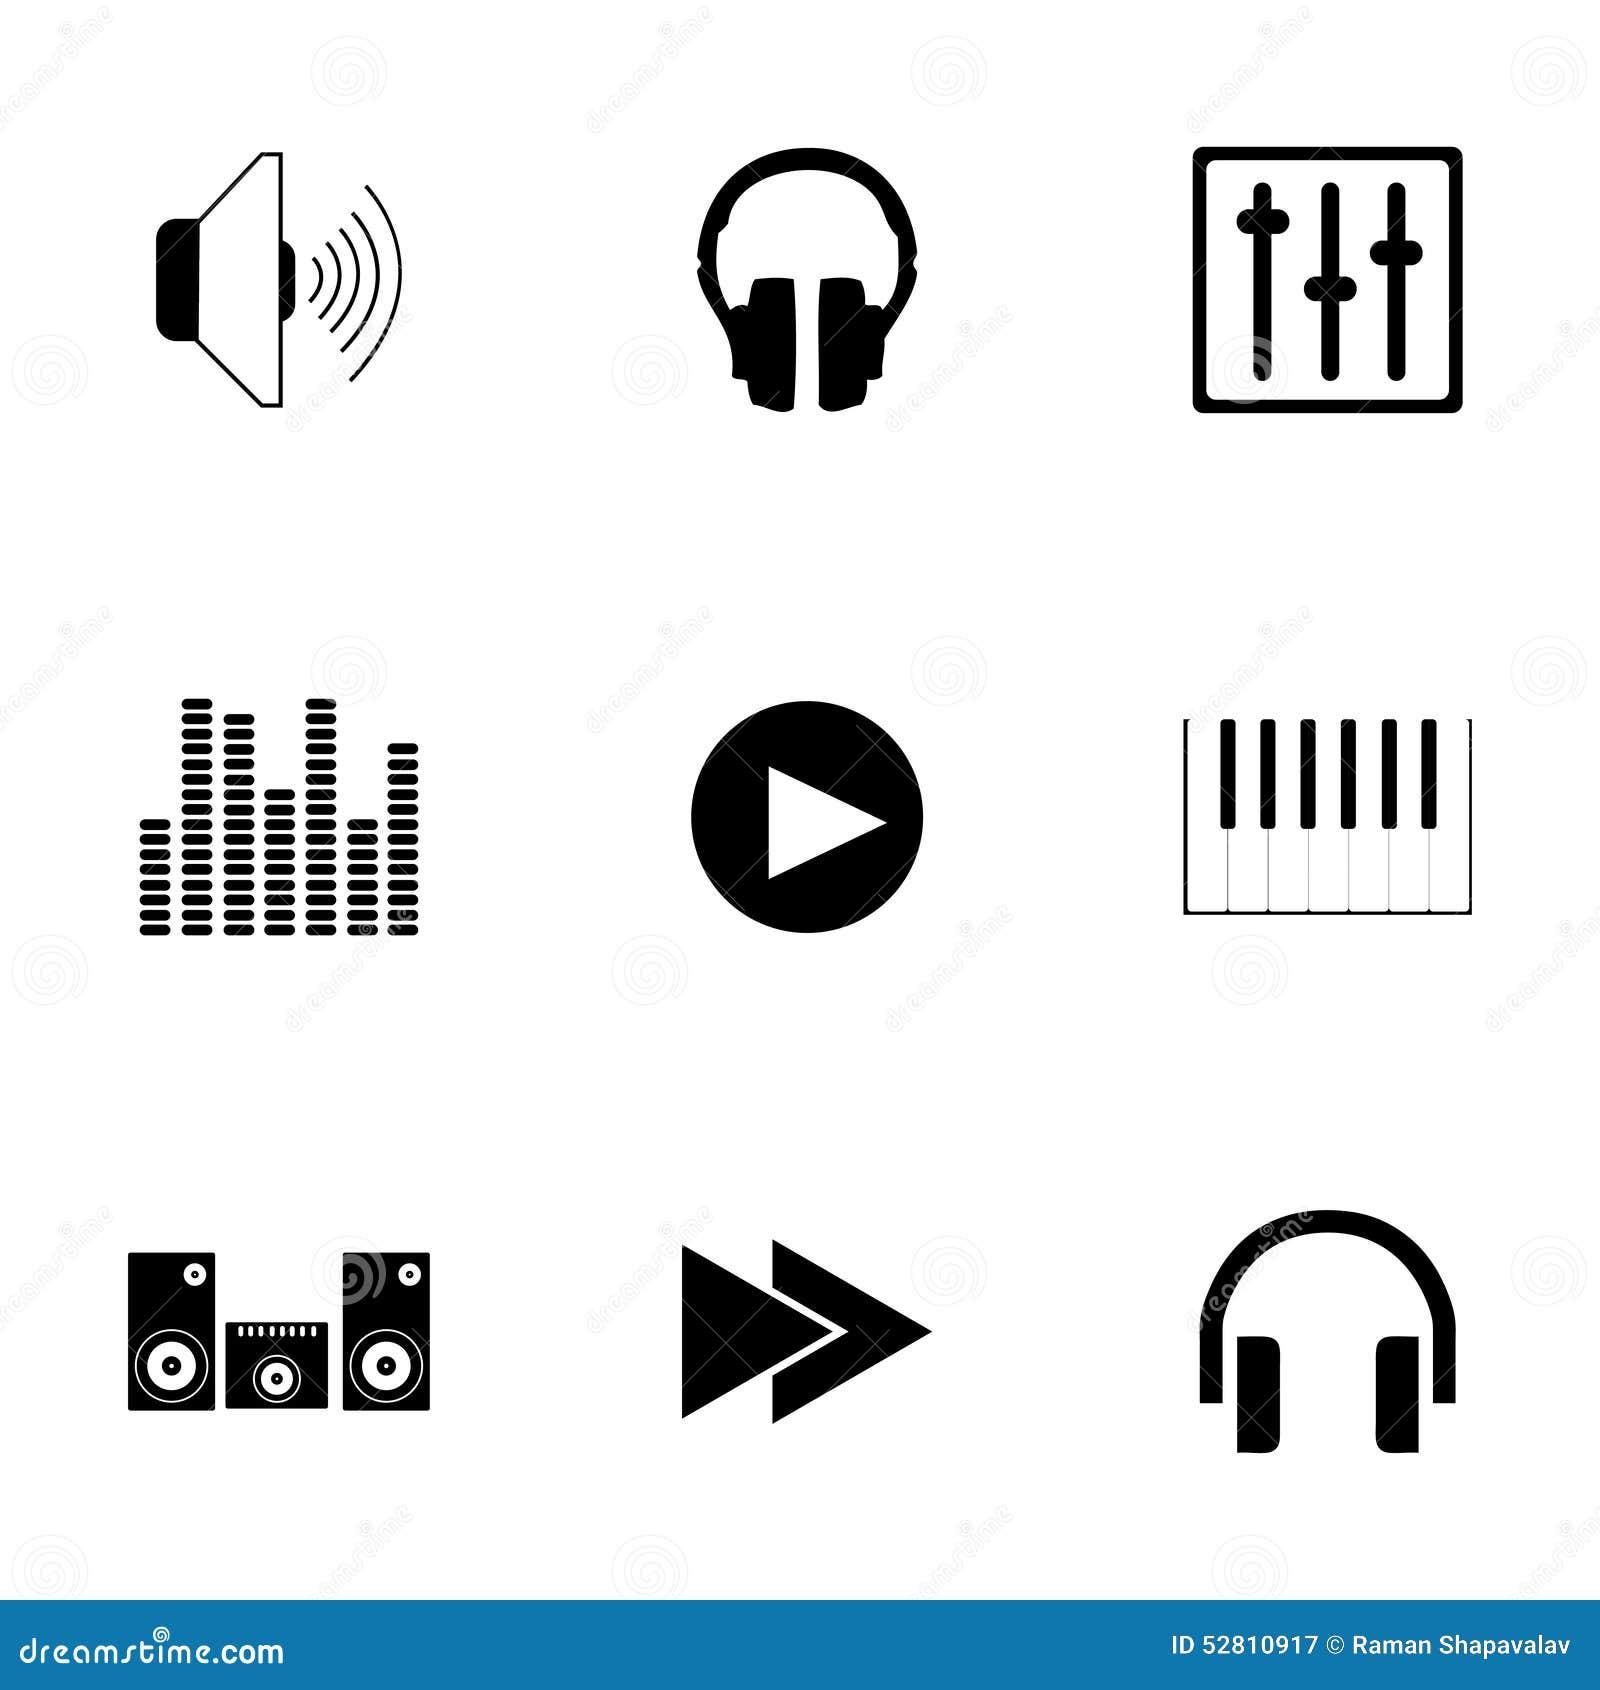 freefree4u: White Noise Audio Zero Vector VSTi 1.1 WORKiNG